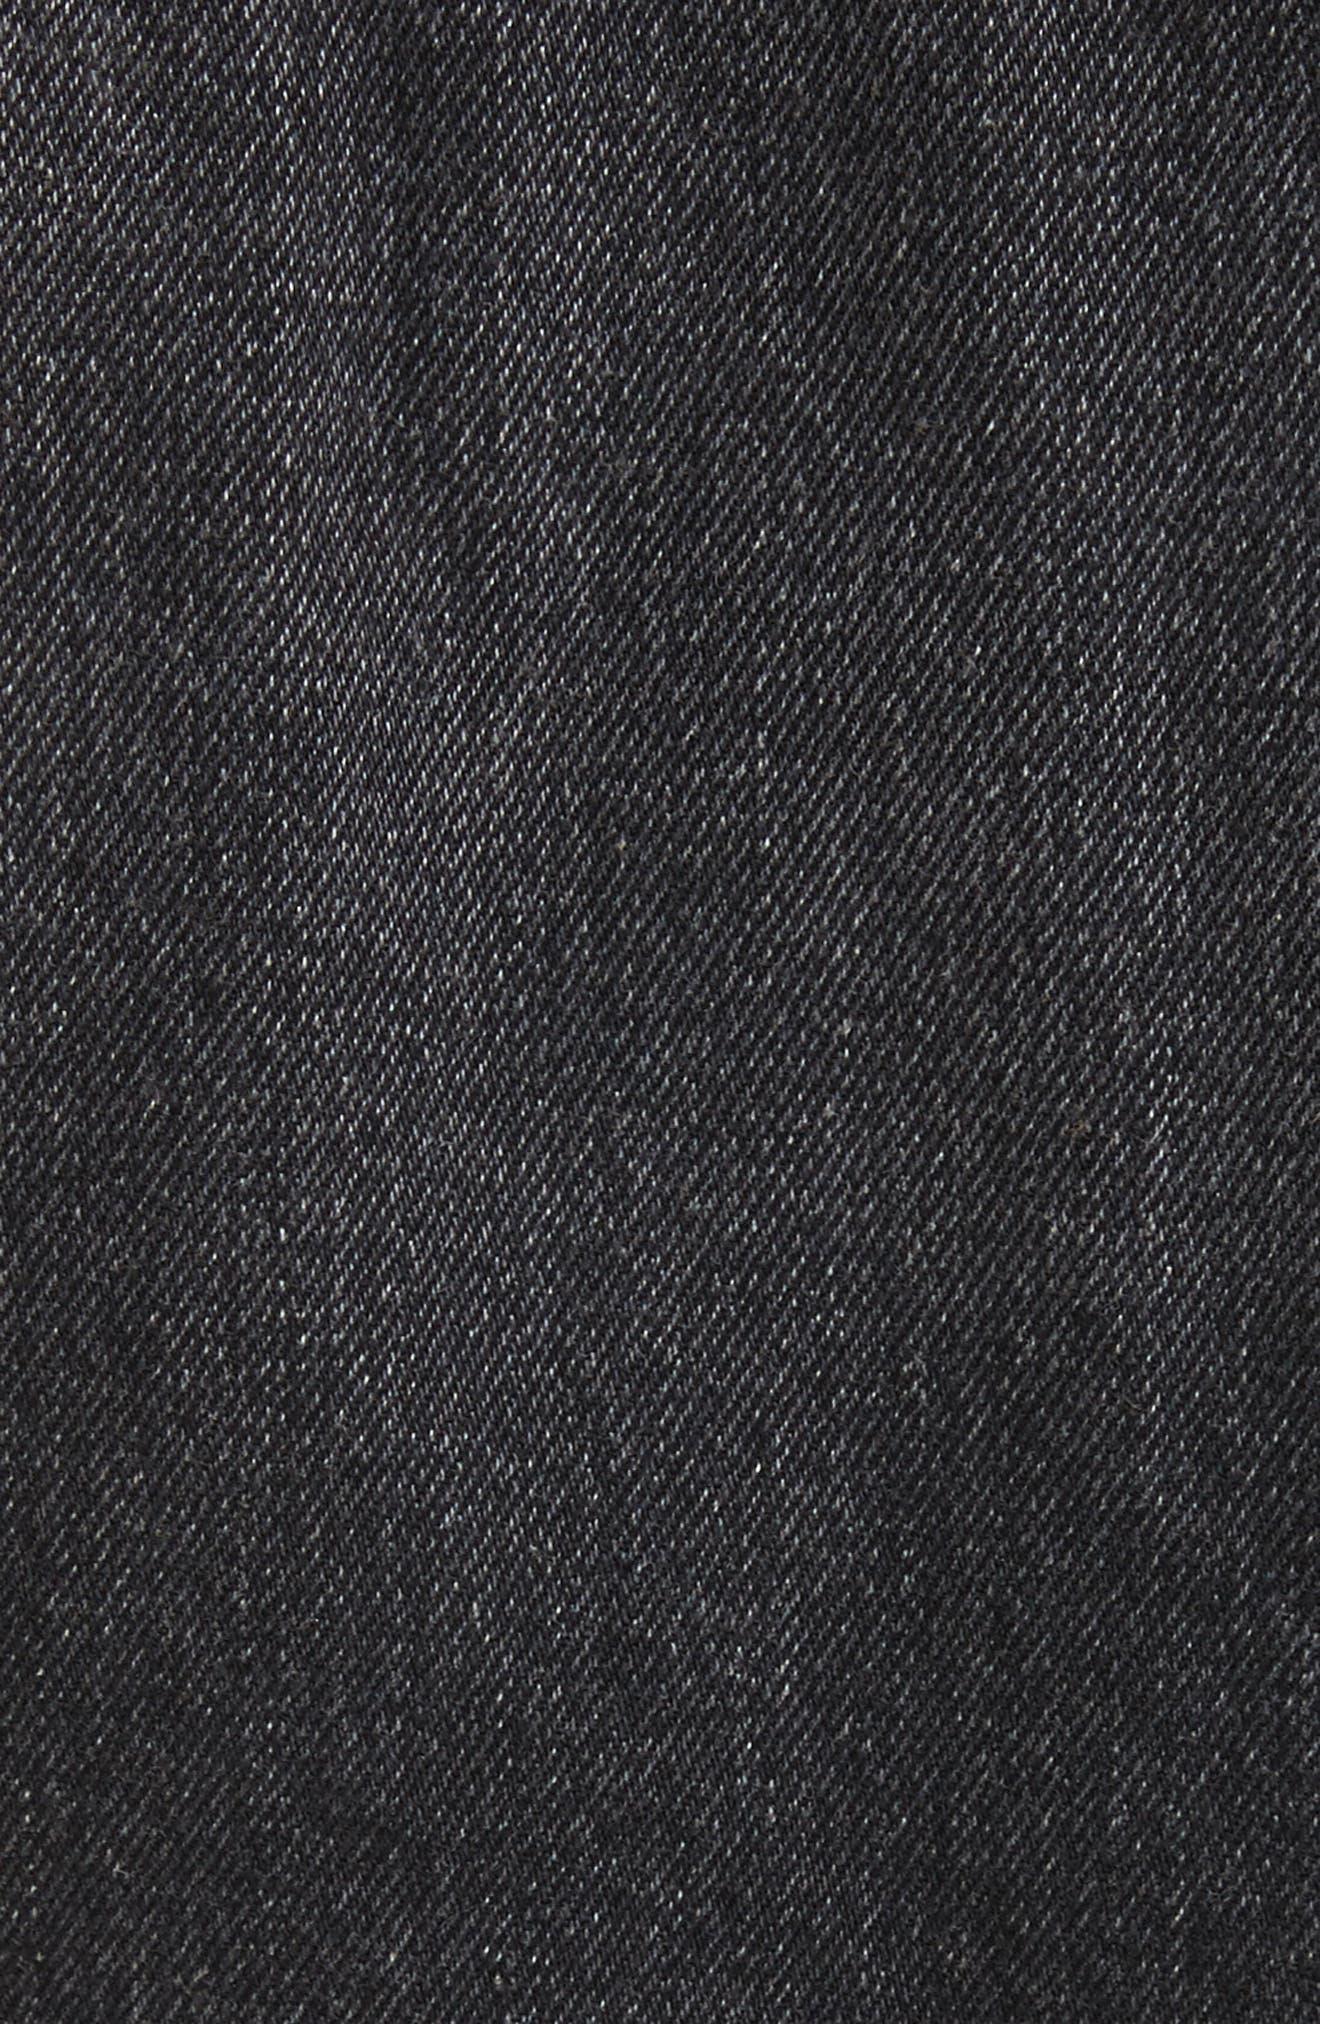 Denim x Alexander Wang Shrunken Jean Jacket,                             Alternate thumbnail 5, color,                             Grey Aged